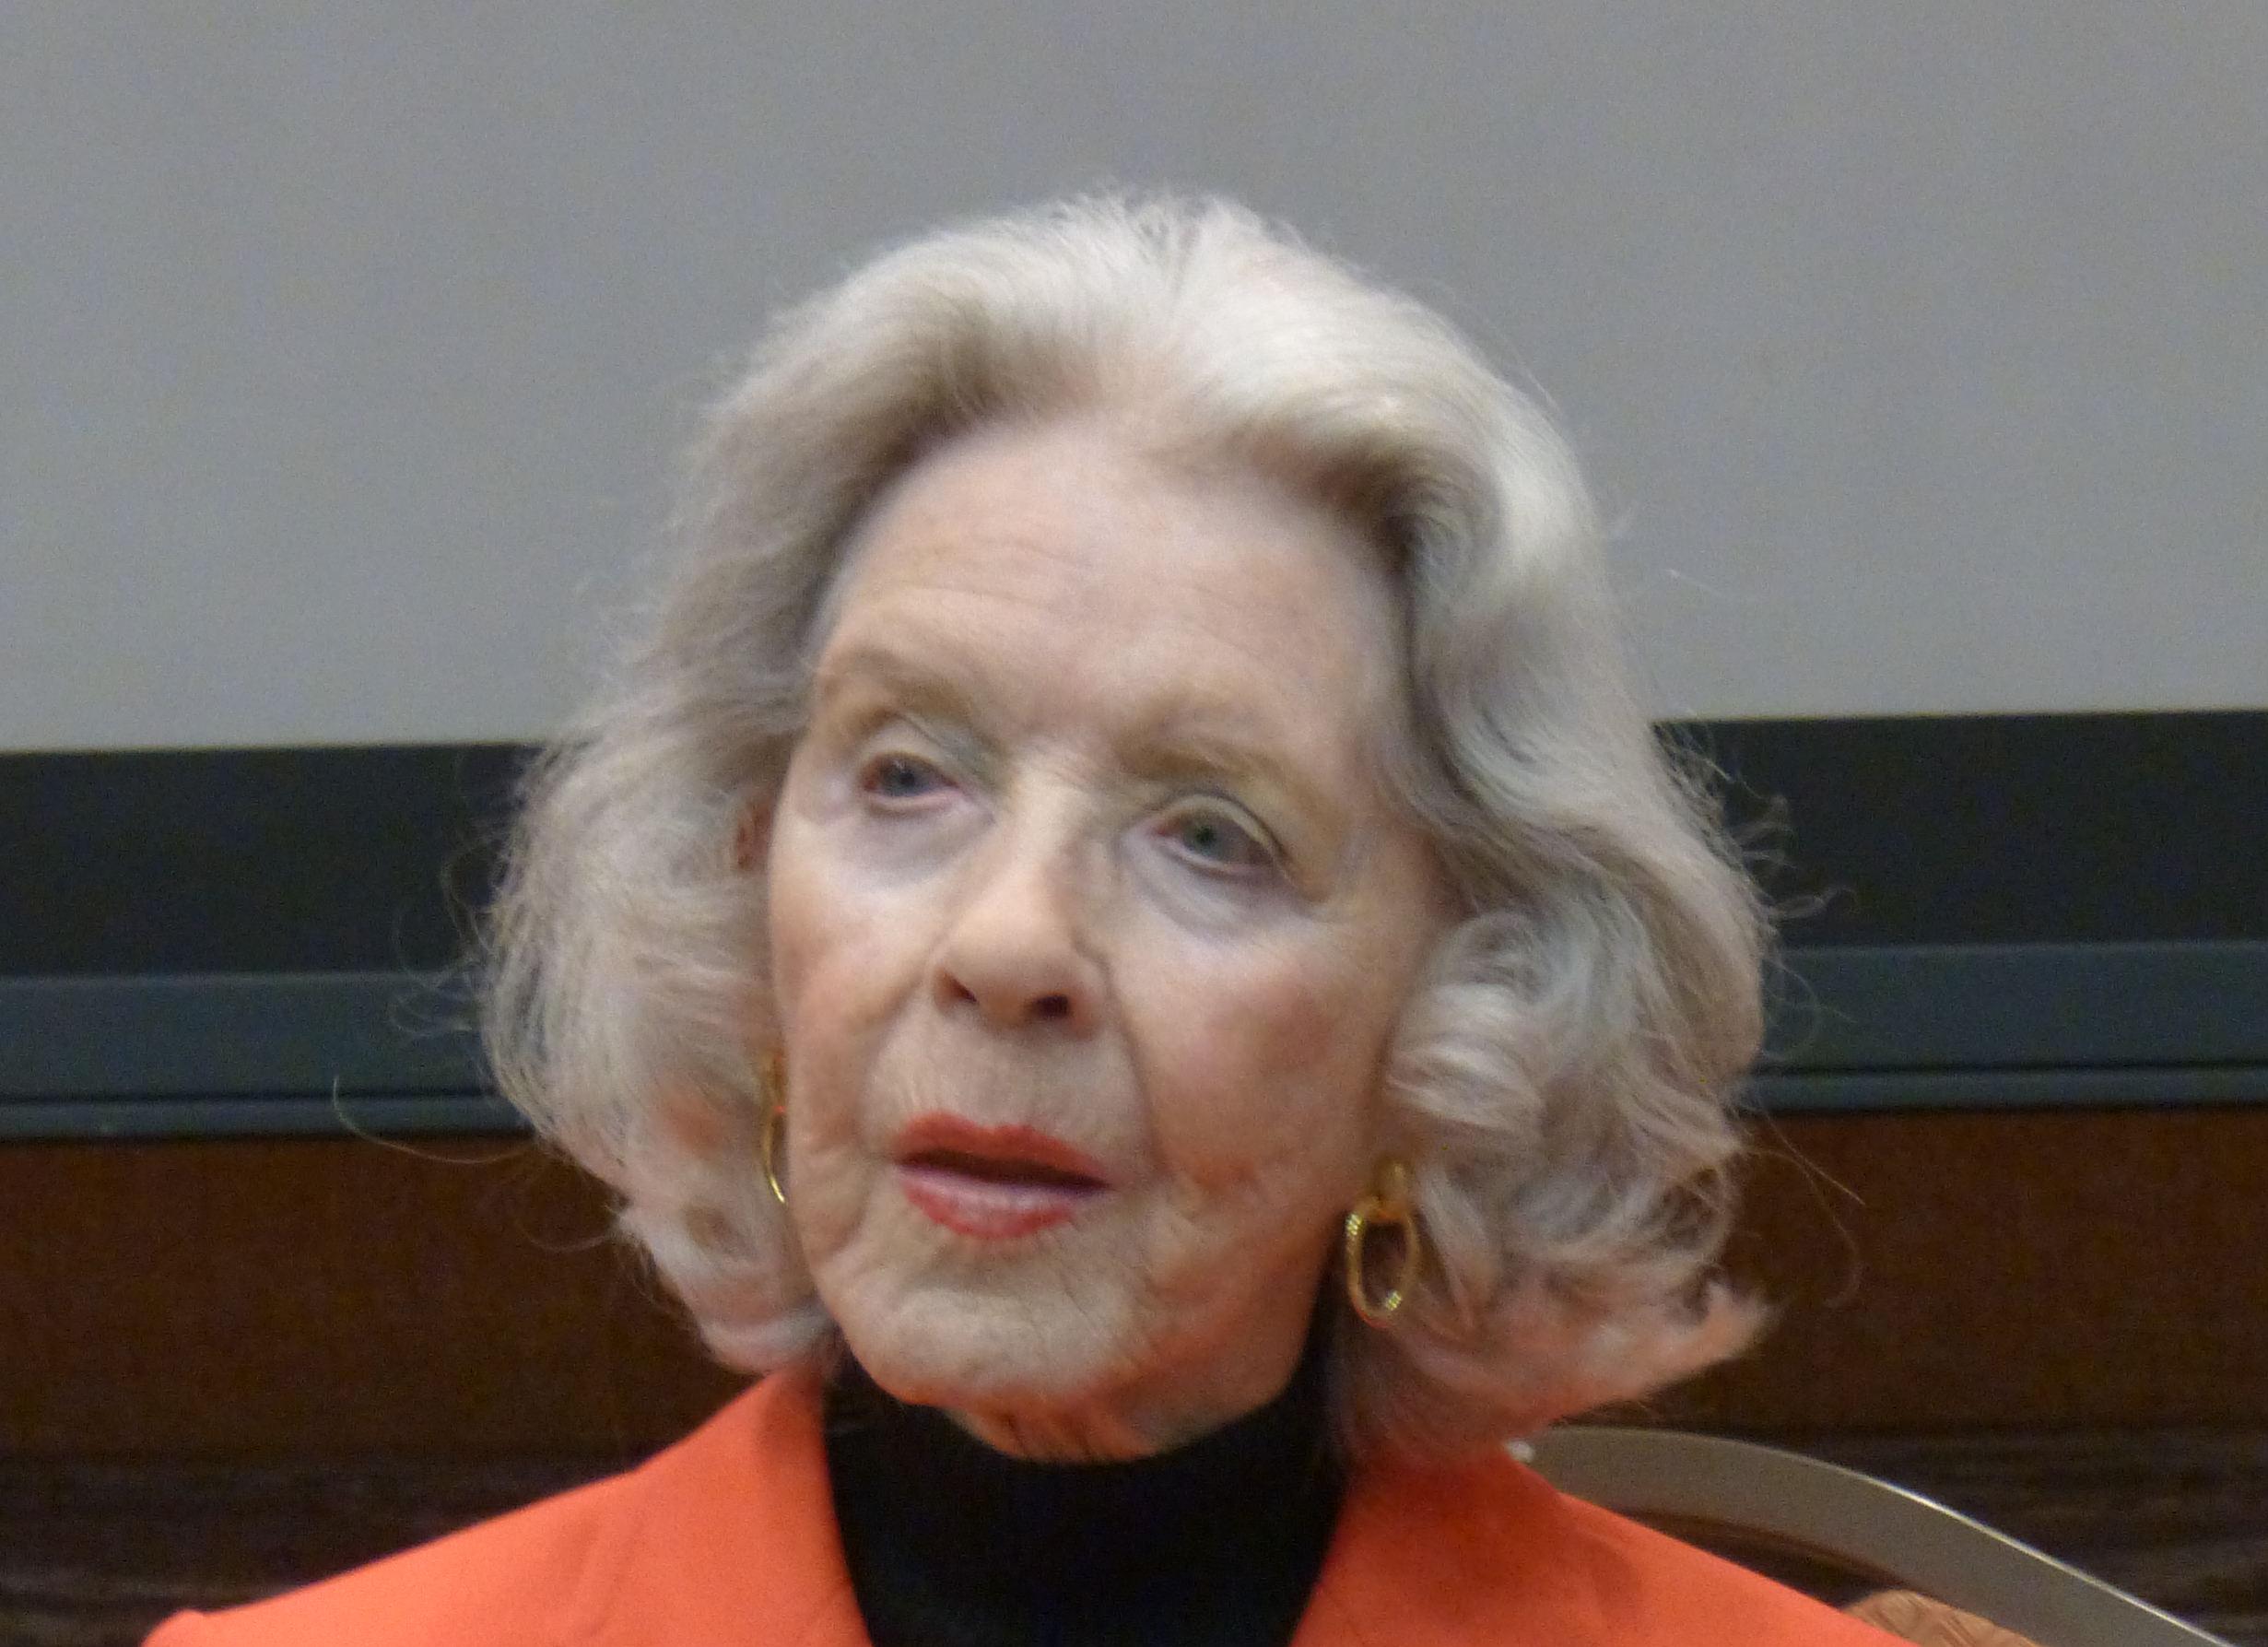 via Commons.wikimedia.org